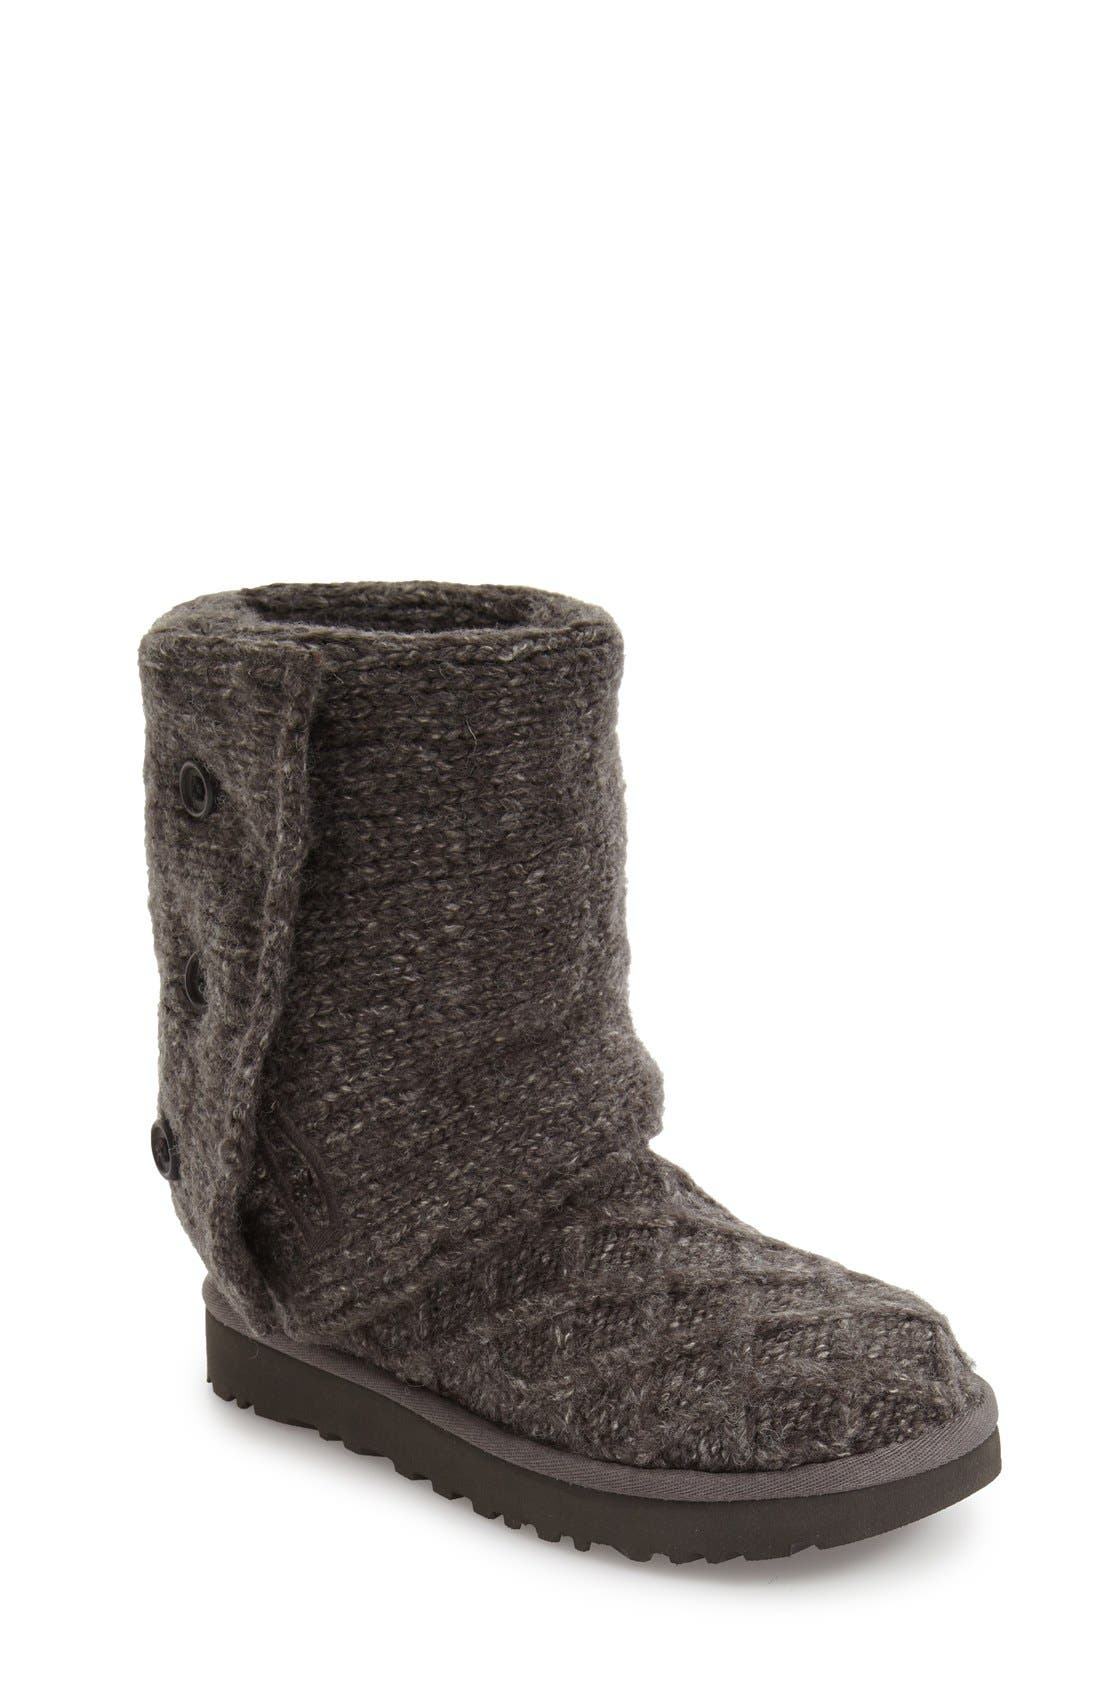 UGG<SUP>®</SUP> Lattice Cardy II Boot, Main, color, 020